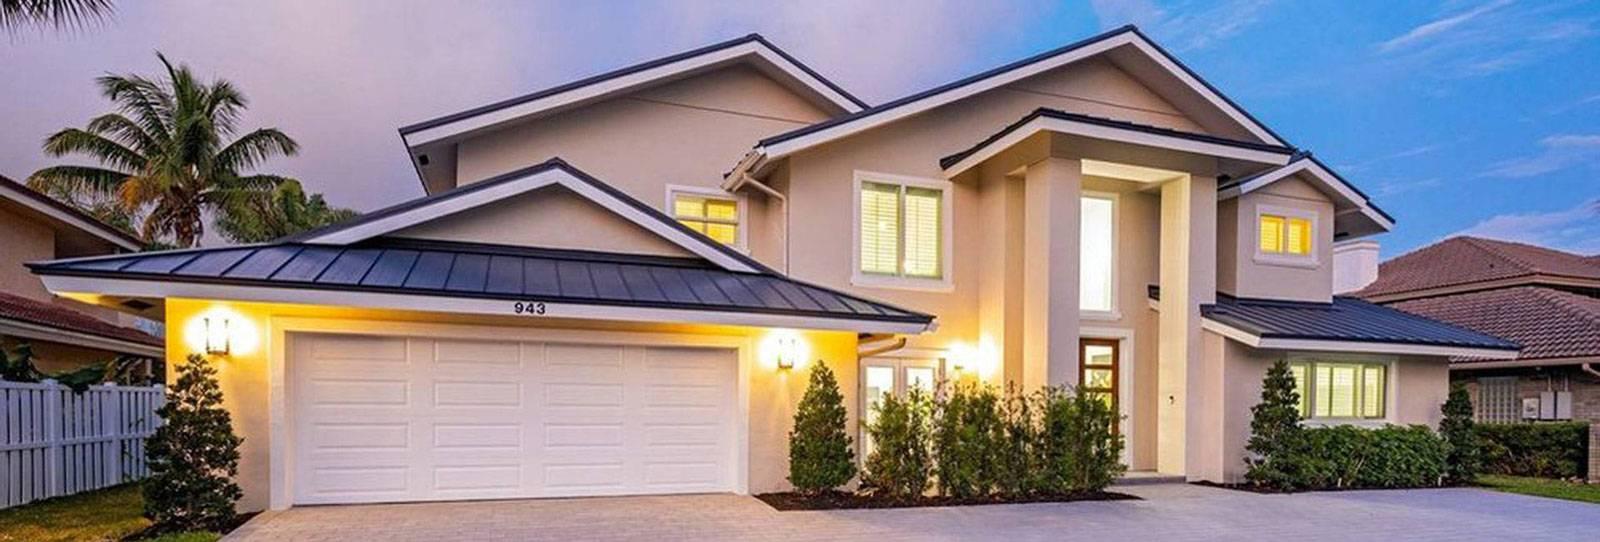 Home Improvement Contractors in Boca Raton, Boynton Beach, Lake Worth